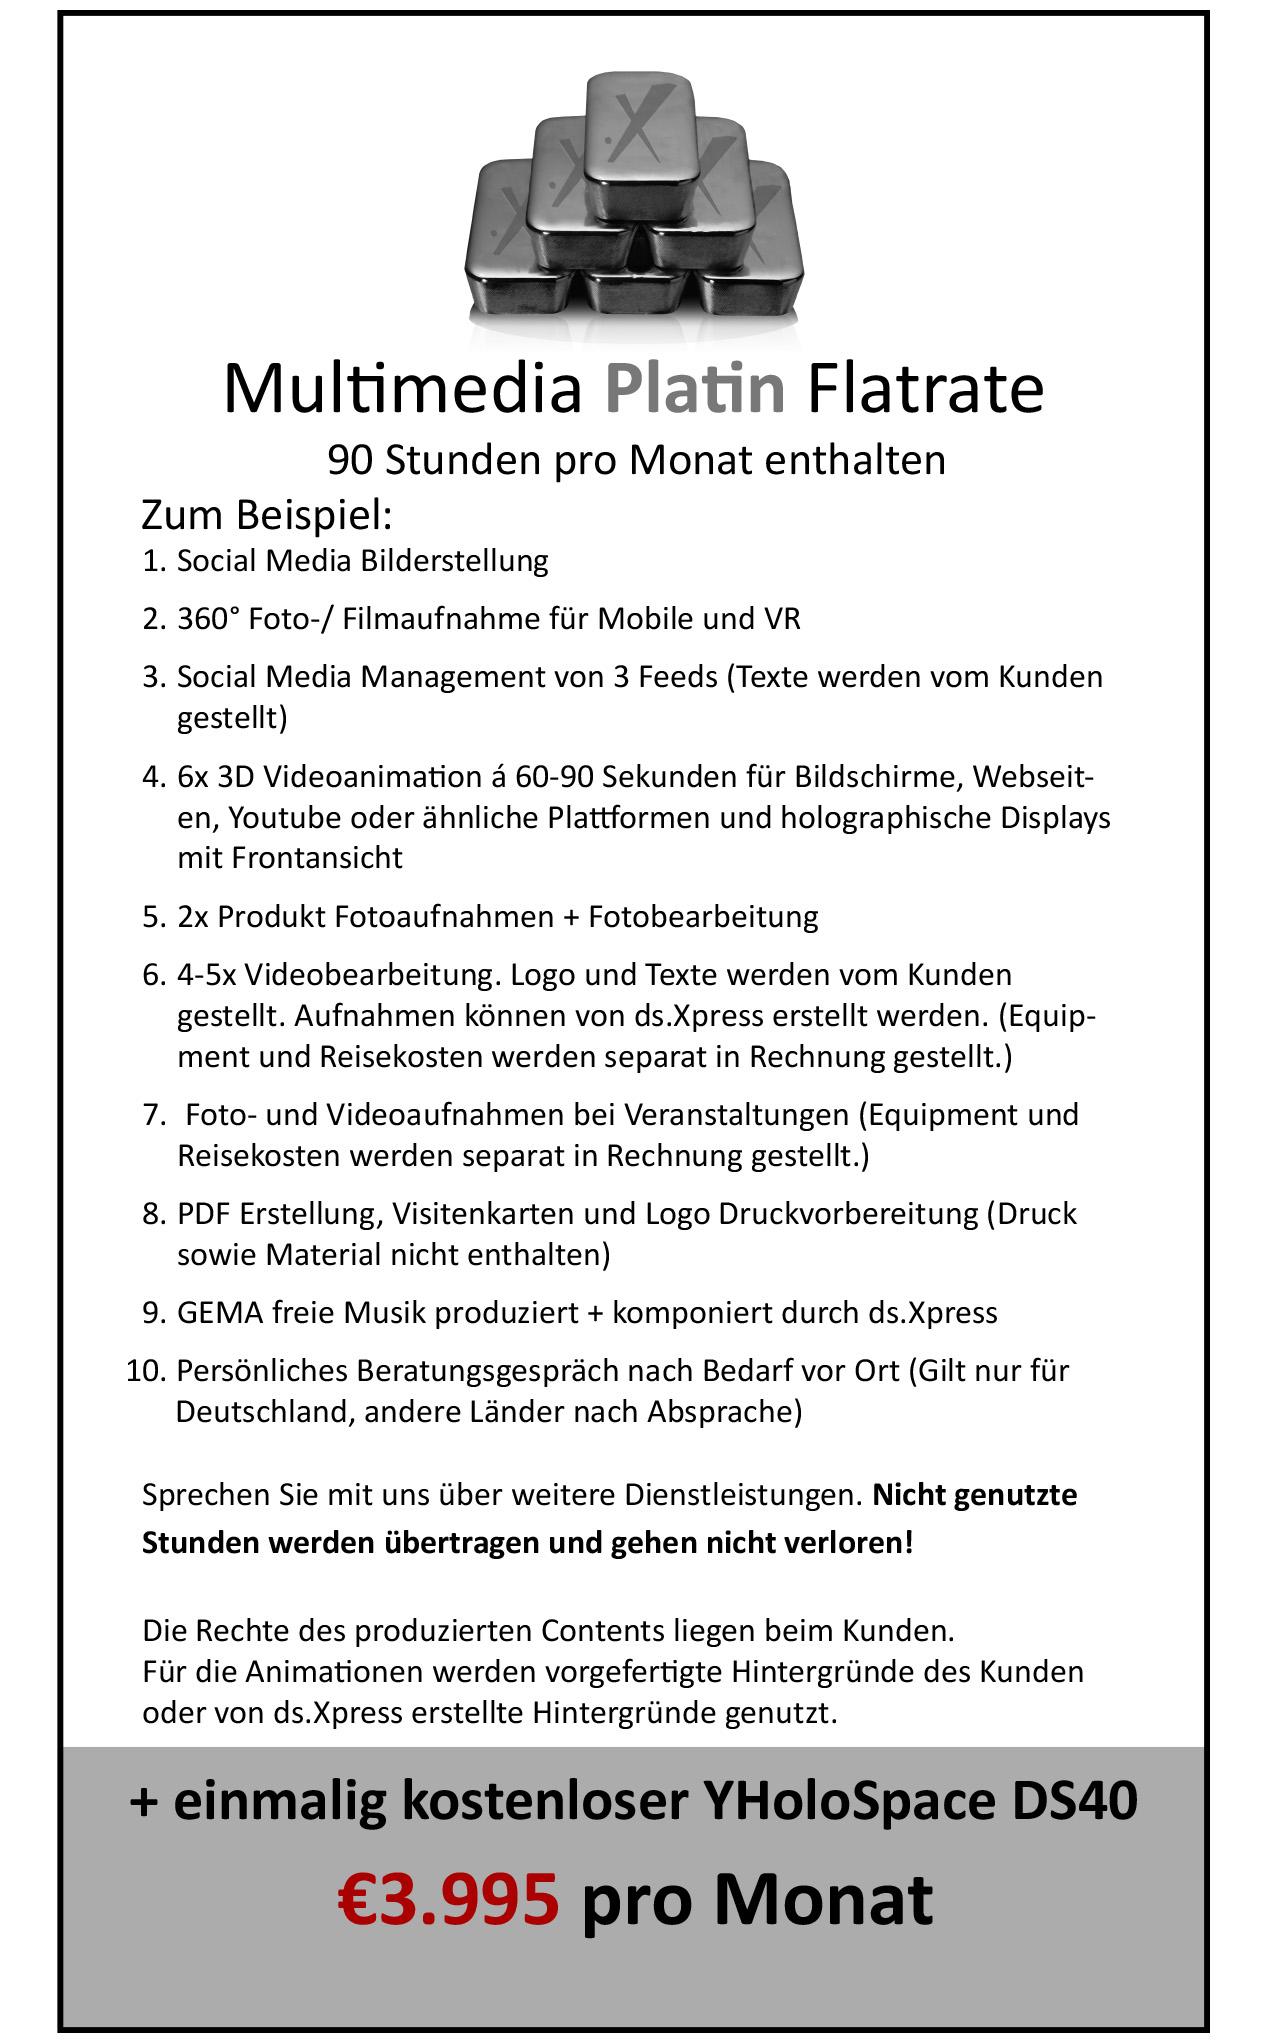 Multimedia Flatrate Platin01